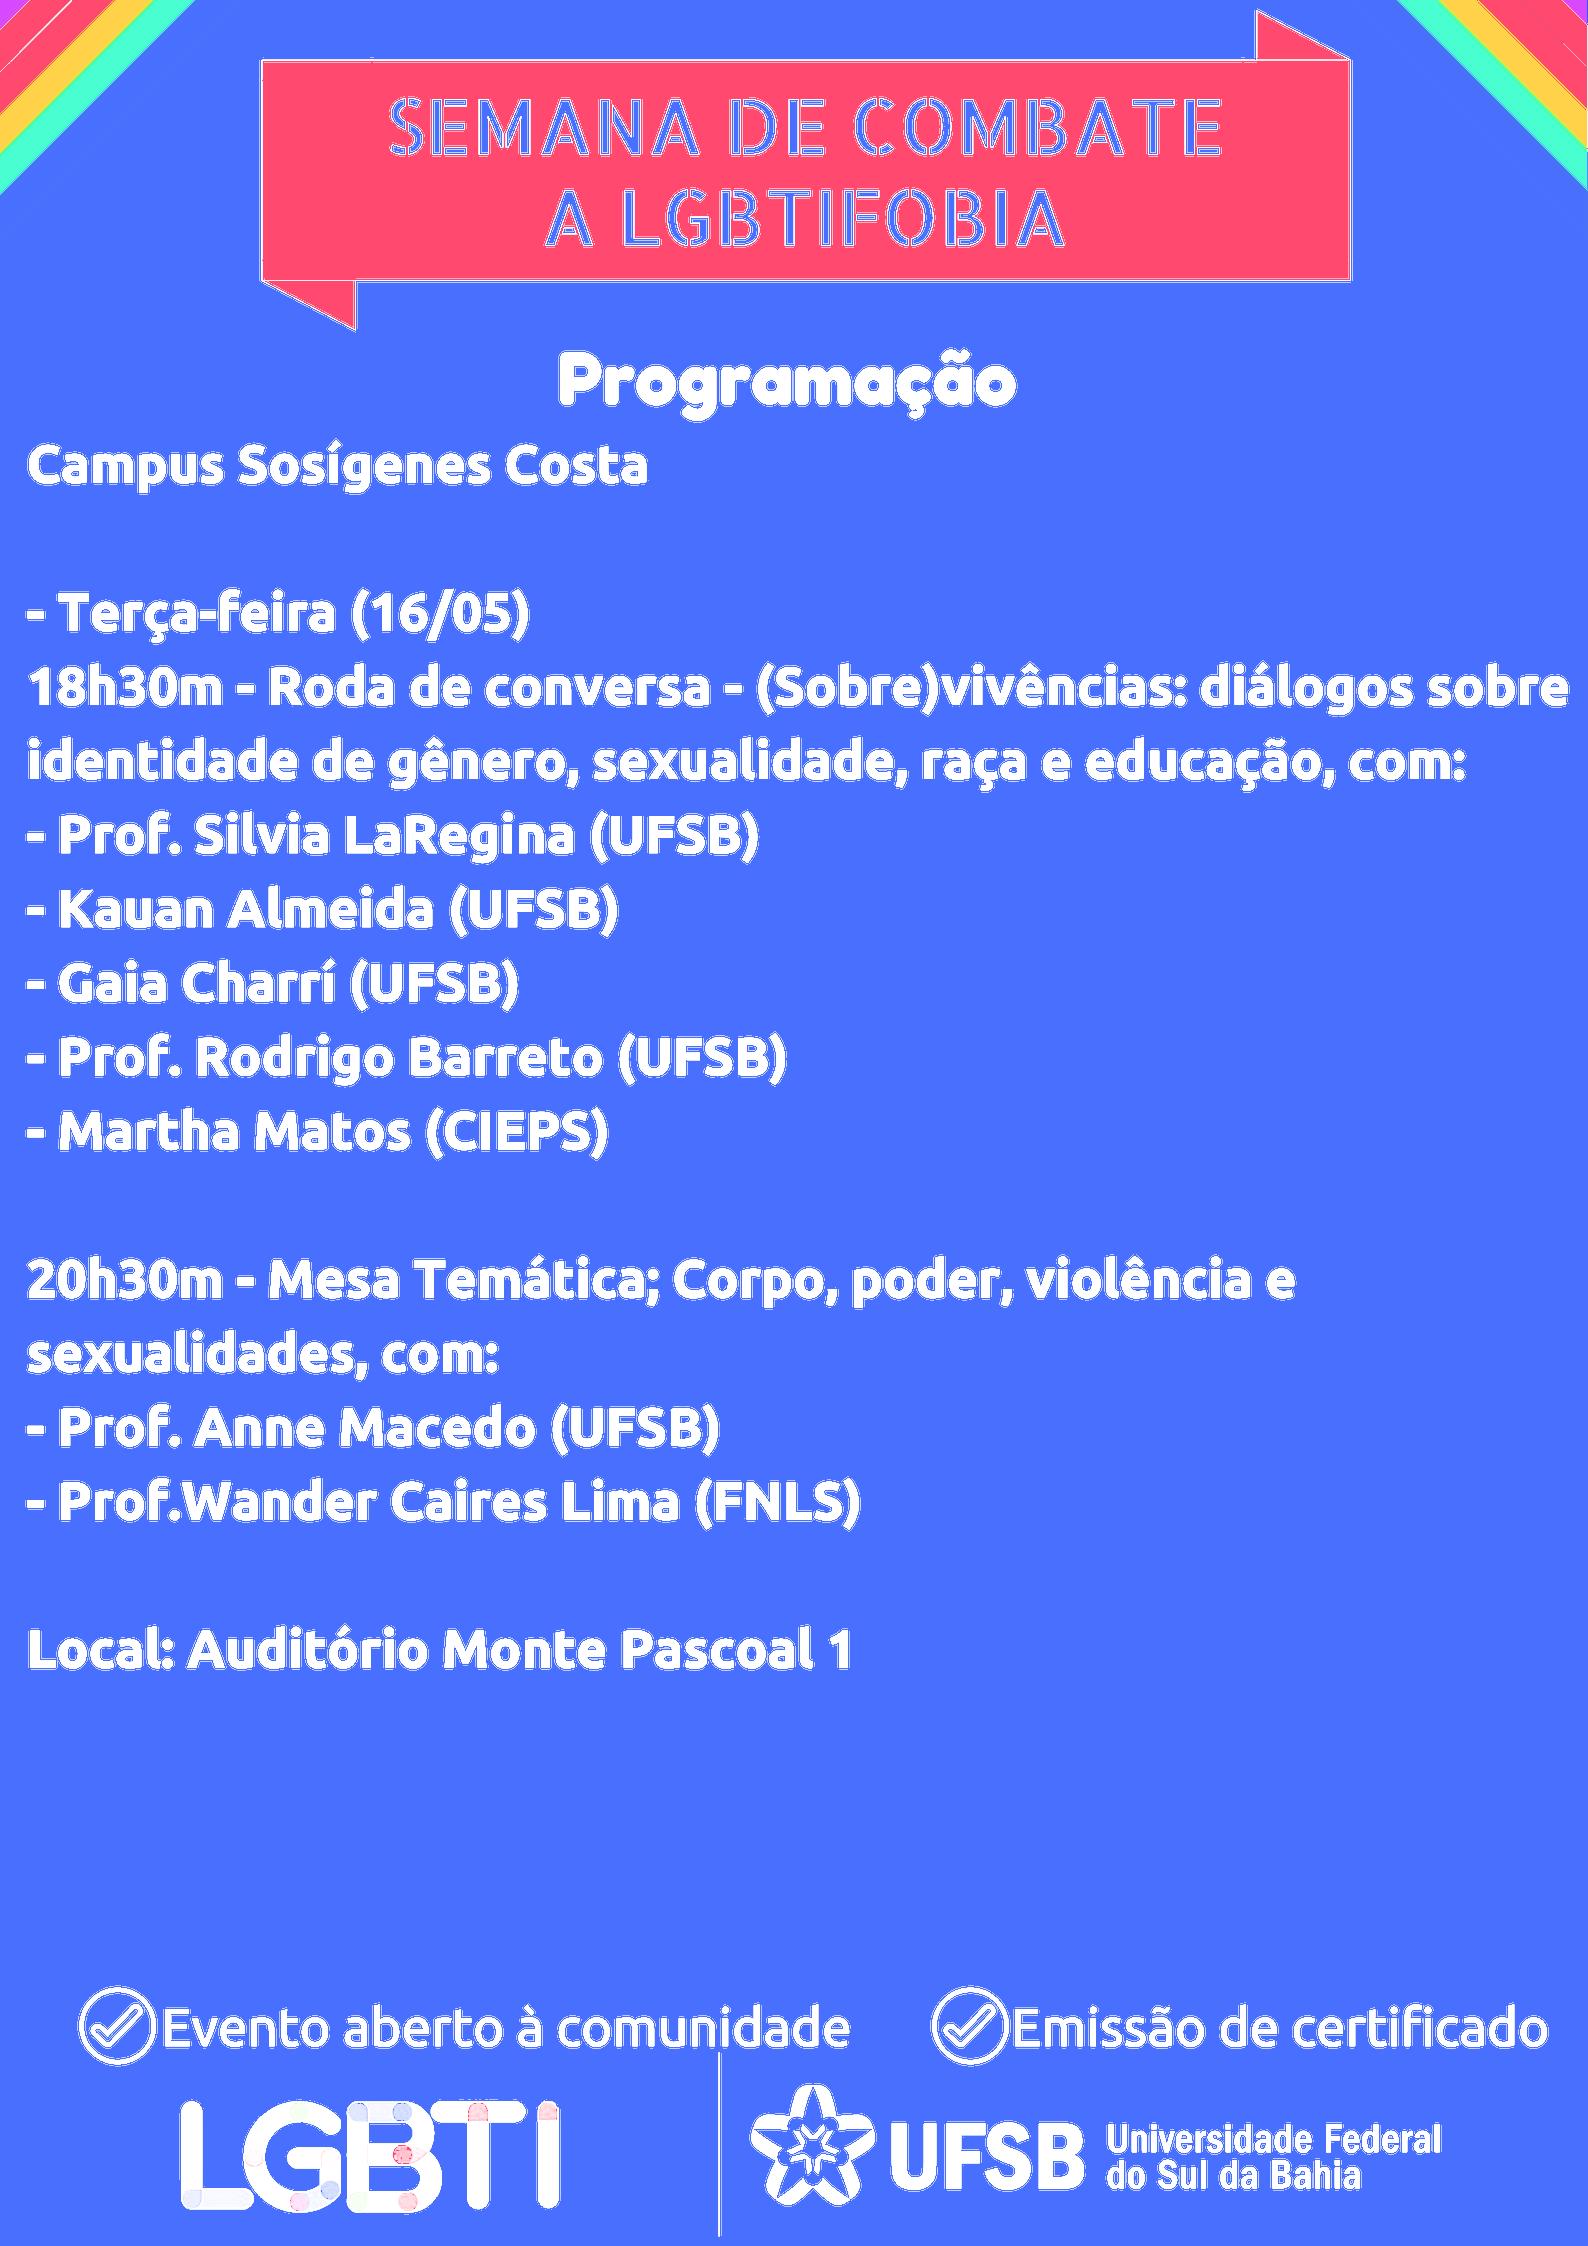 Programação Semana de combate a LGBTIfobia- Campus Sosígenes Costa